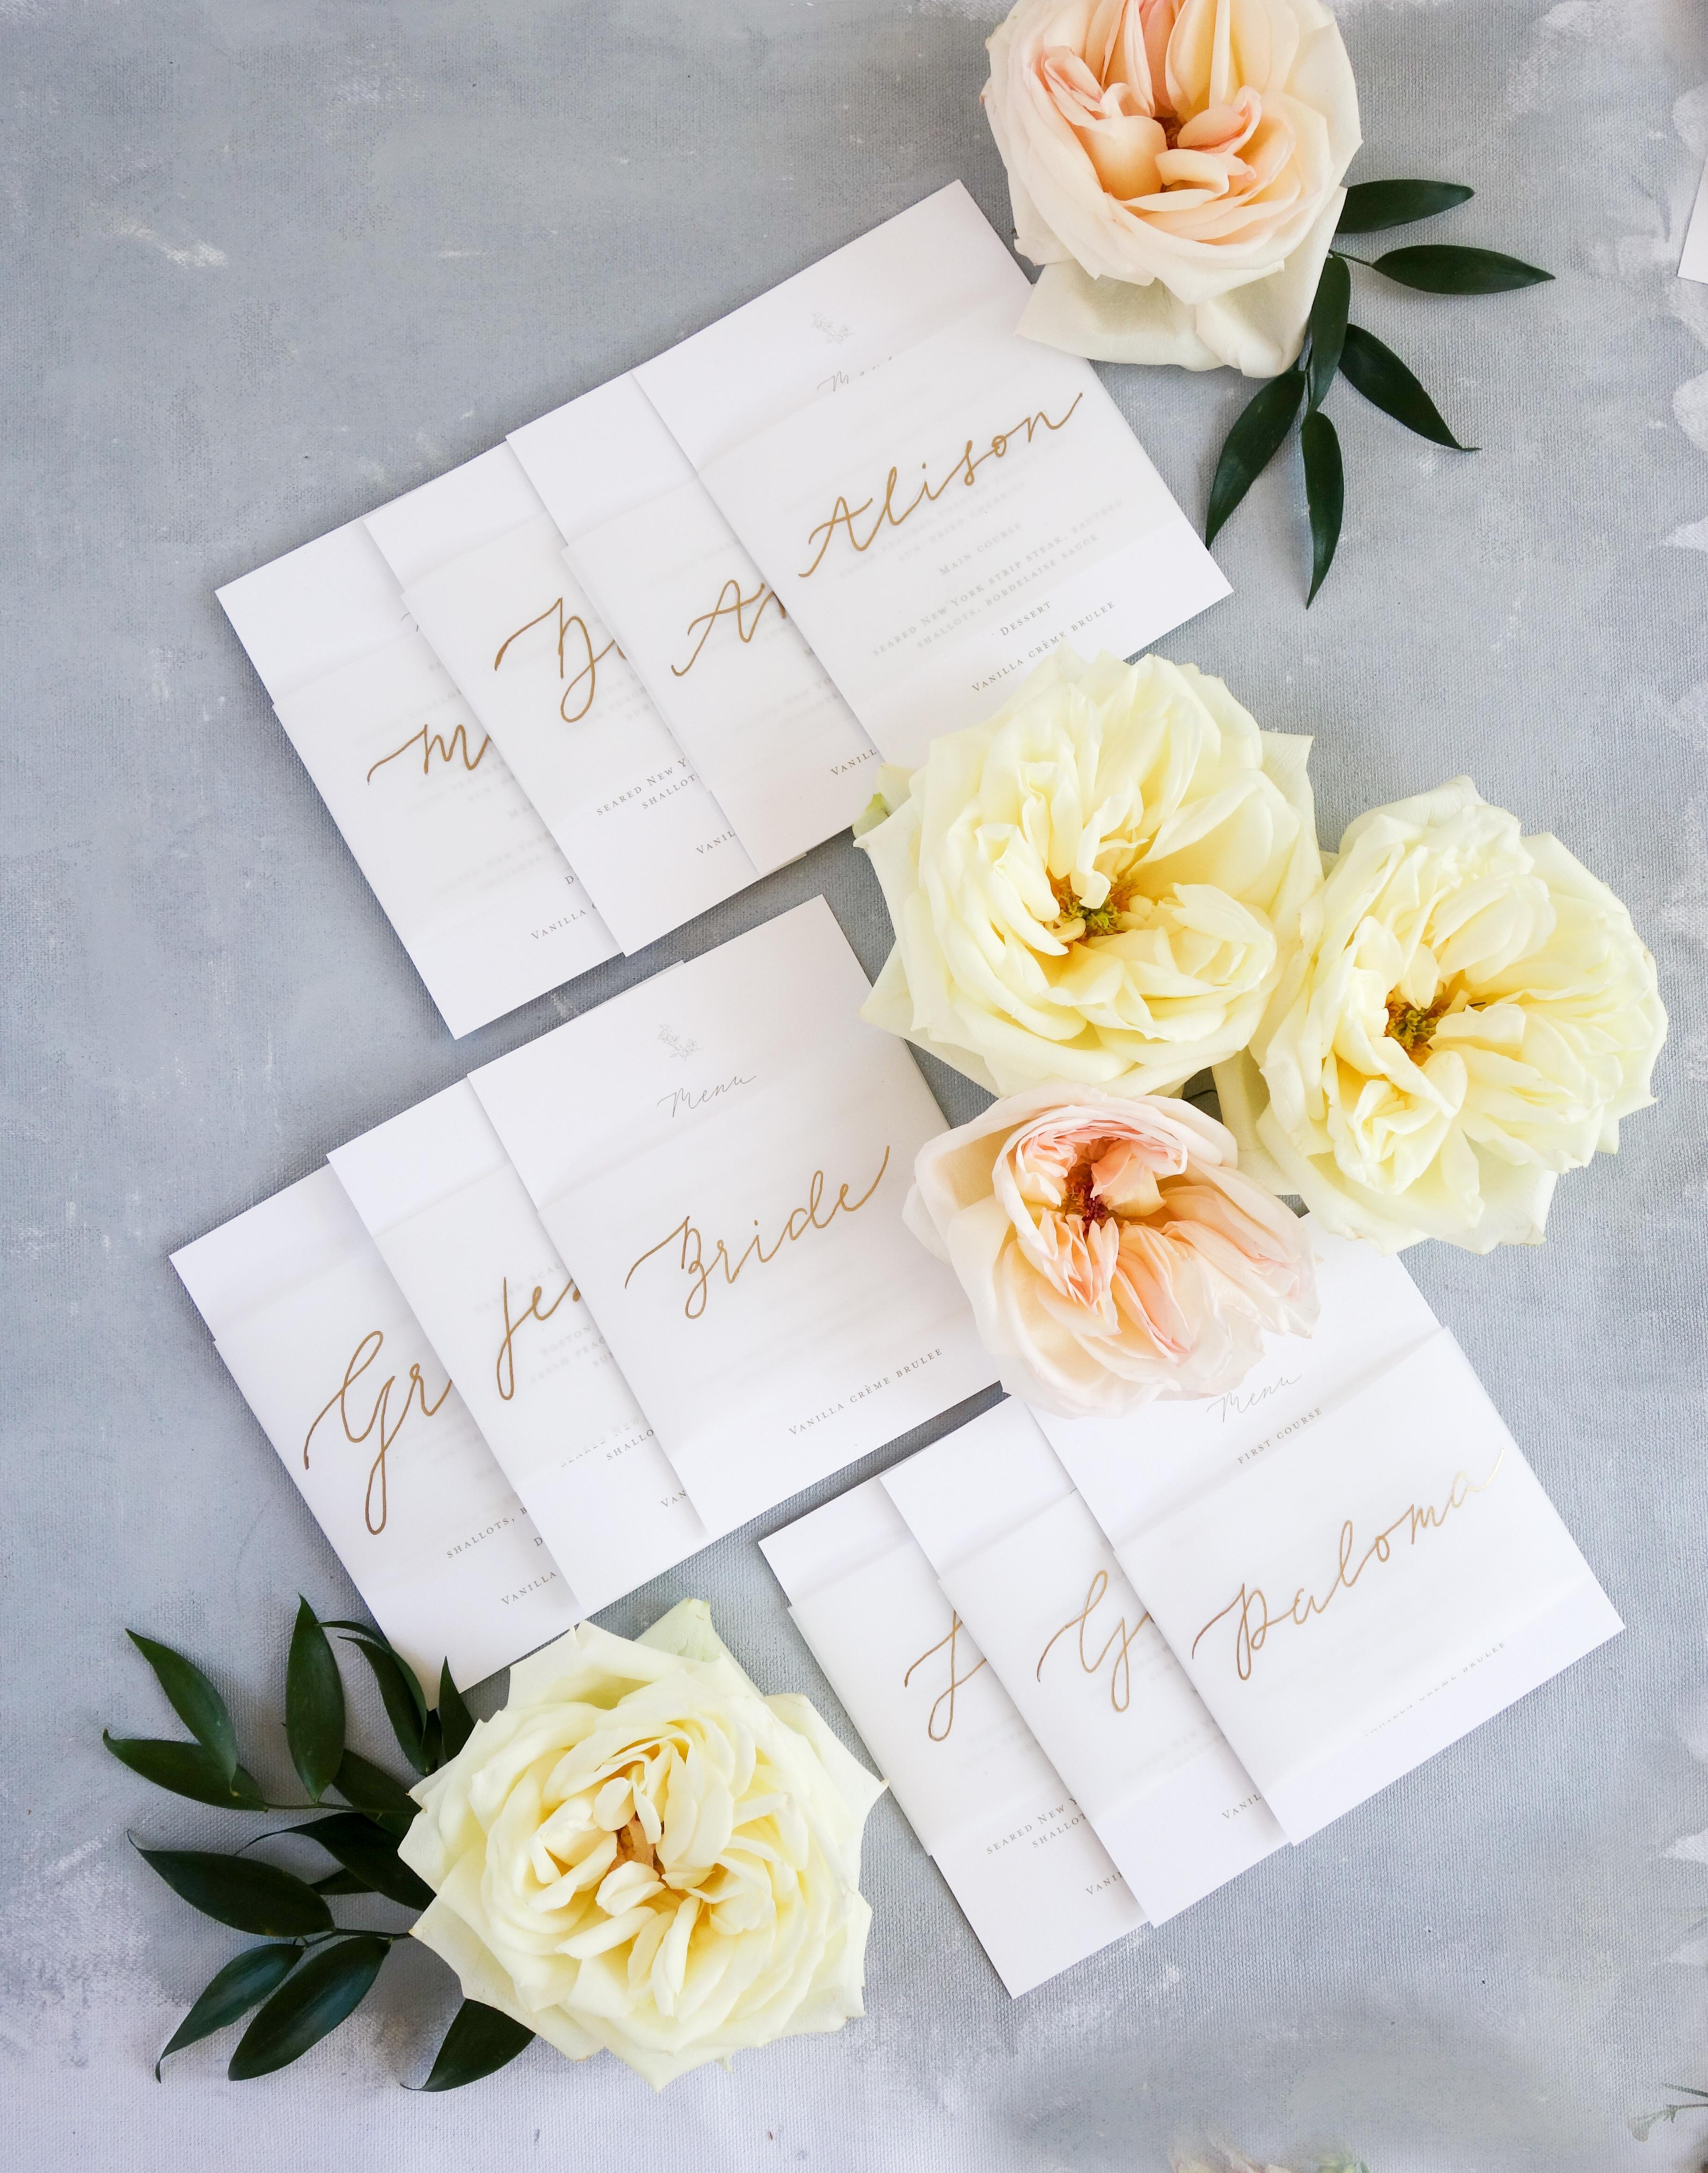 Chicago Calligrapher Chicago Wedding Invitations (13)